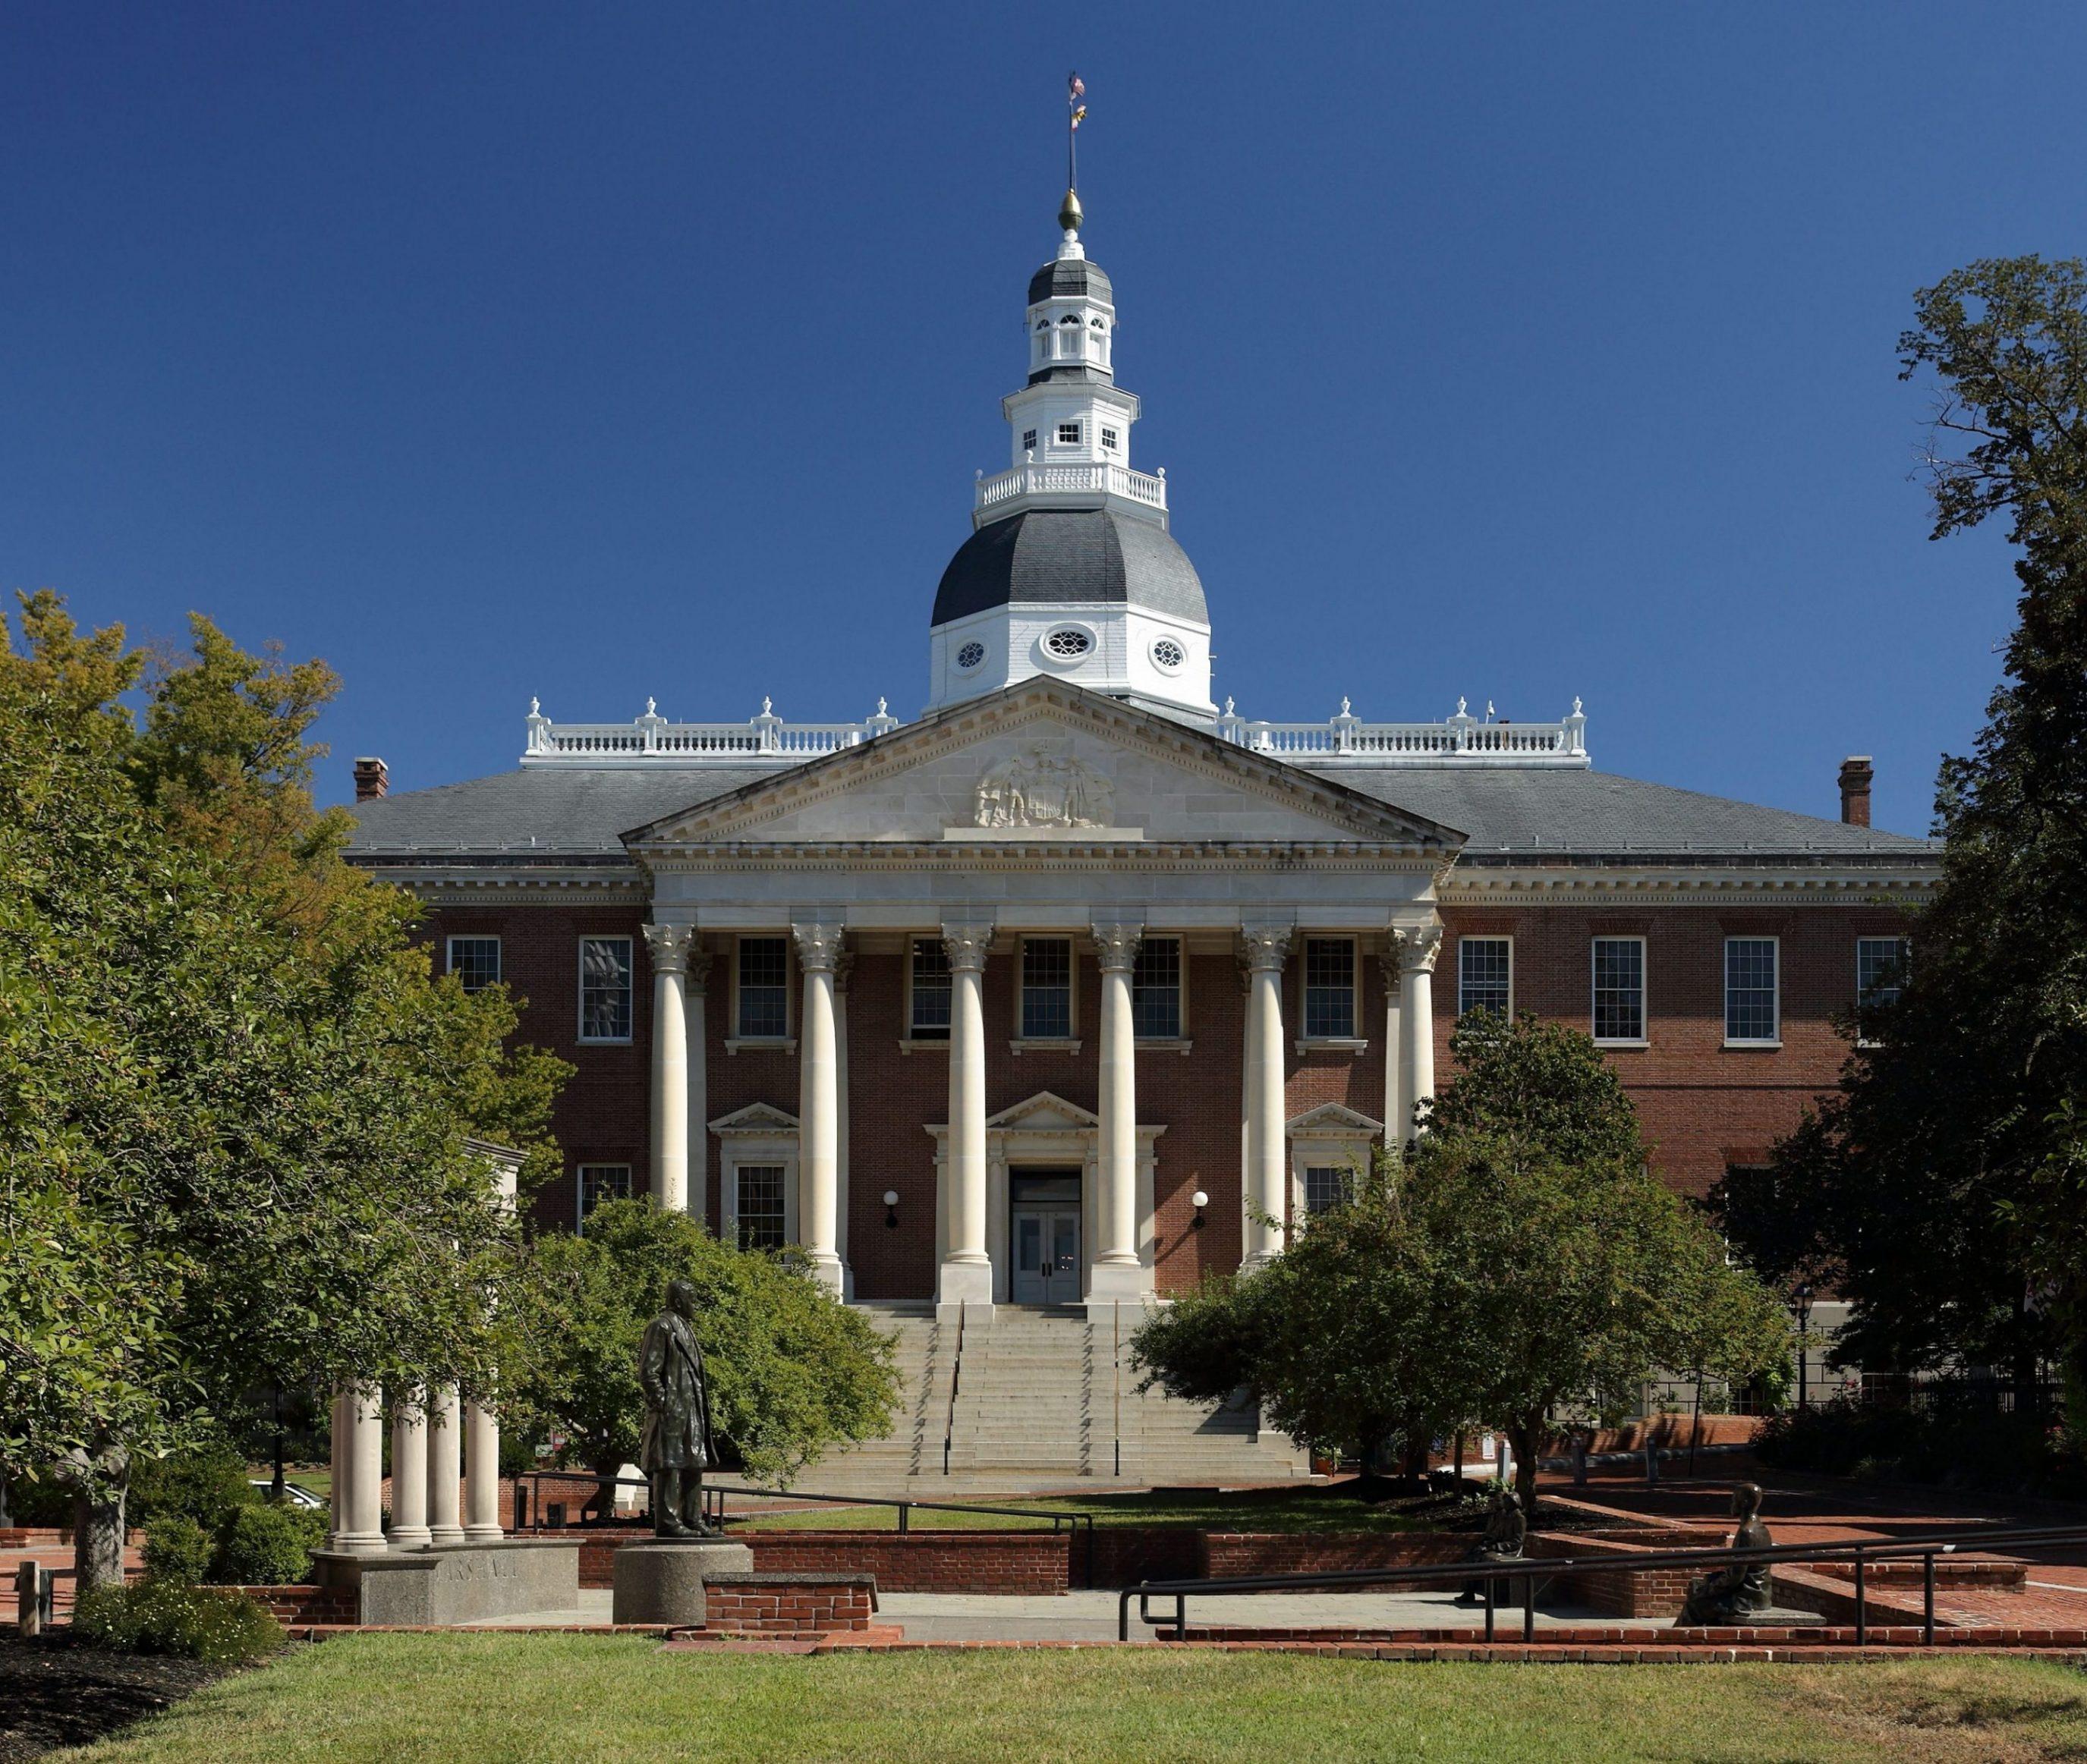 state_house_image_wikimedia_commons.jpg